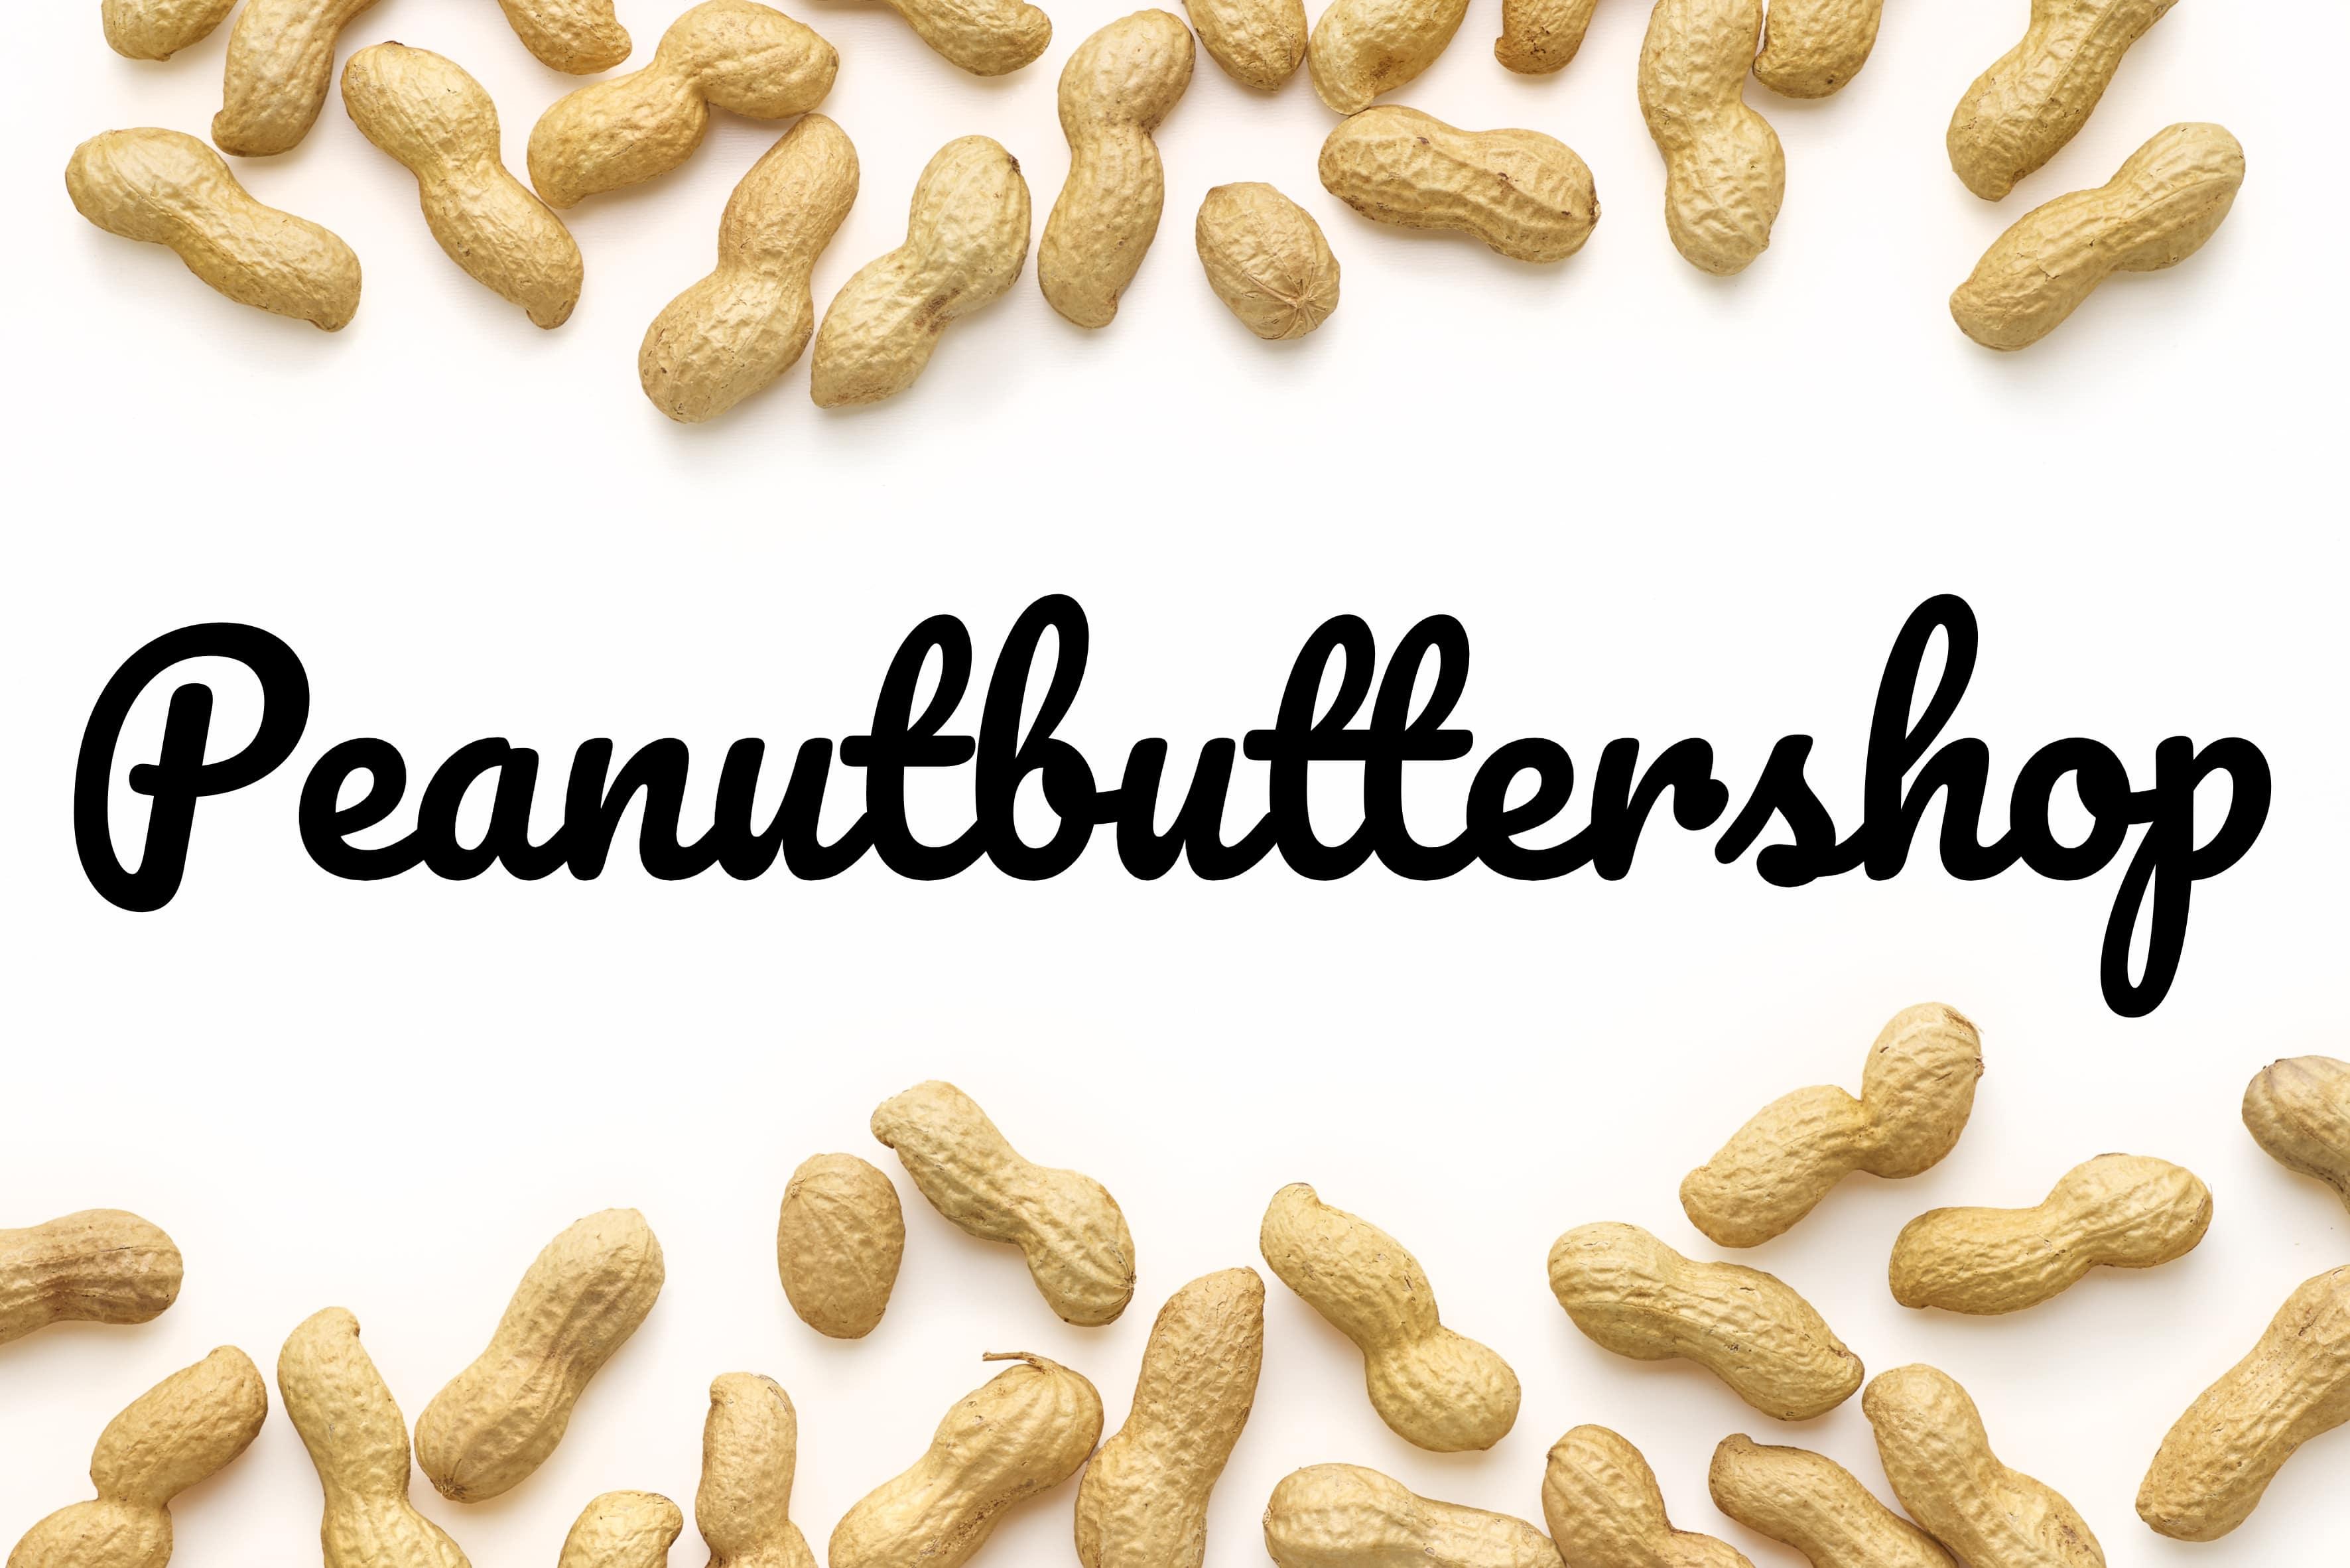 Peanutbuttershop